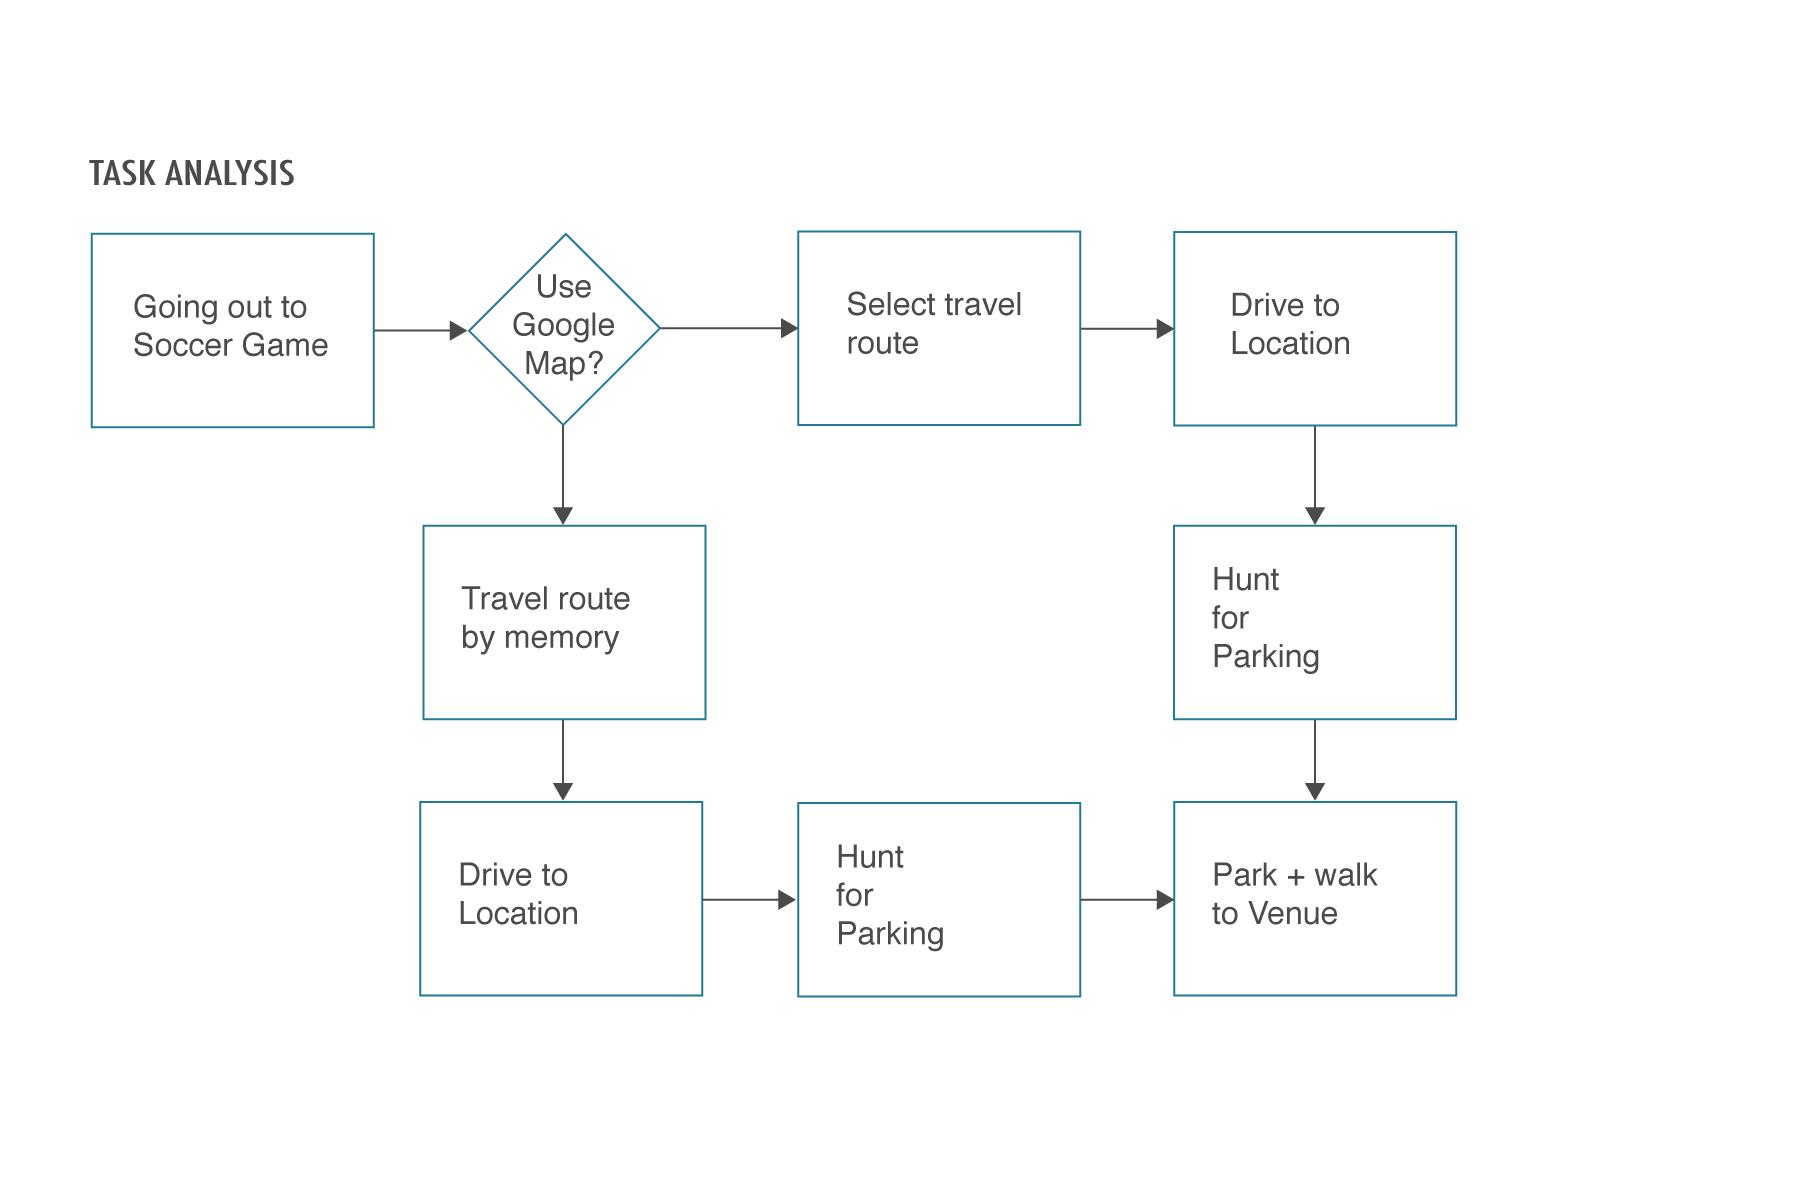 P1-Task_Analysis_V3.jpg